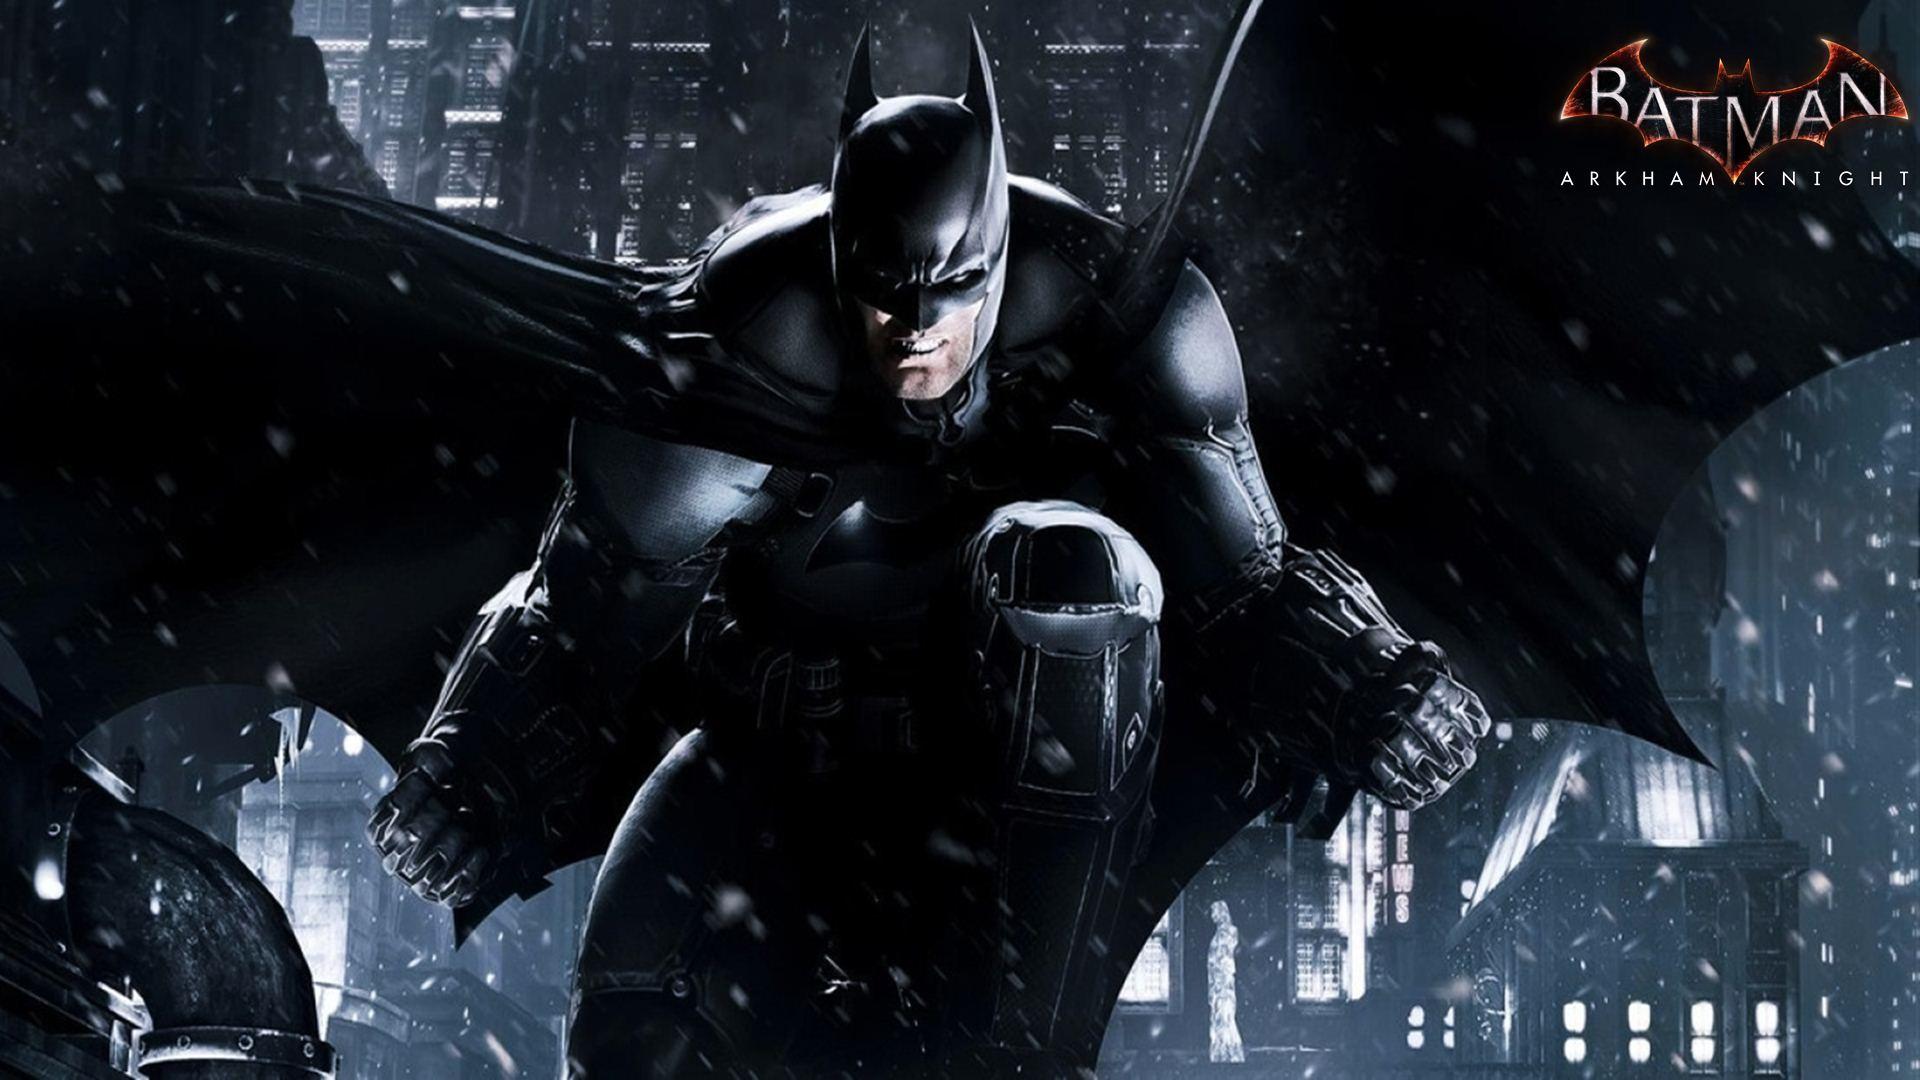 Batman Arkham Knight Hd Wallpaper Background Image 1920x1080